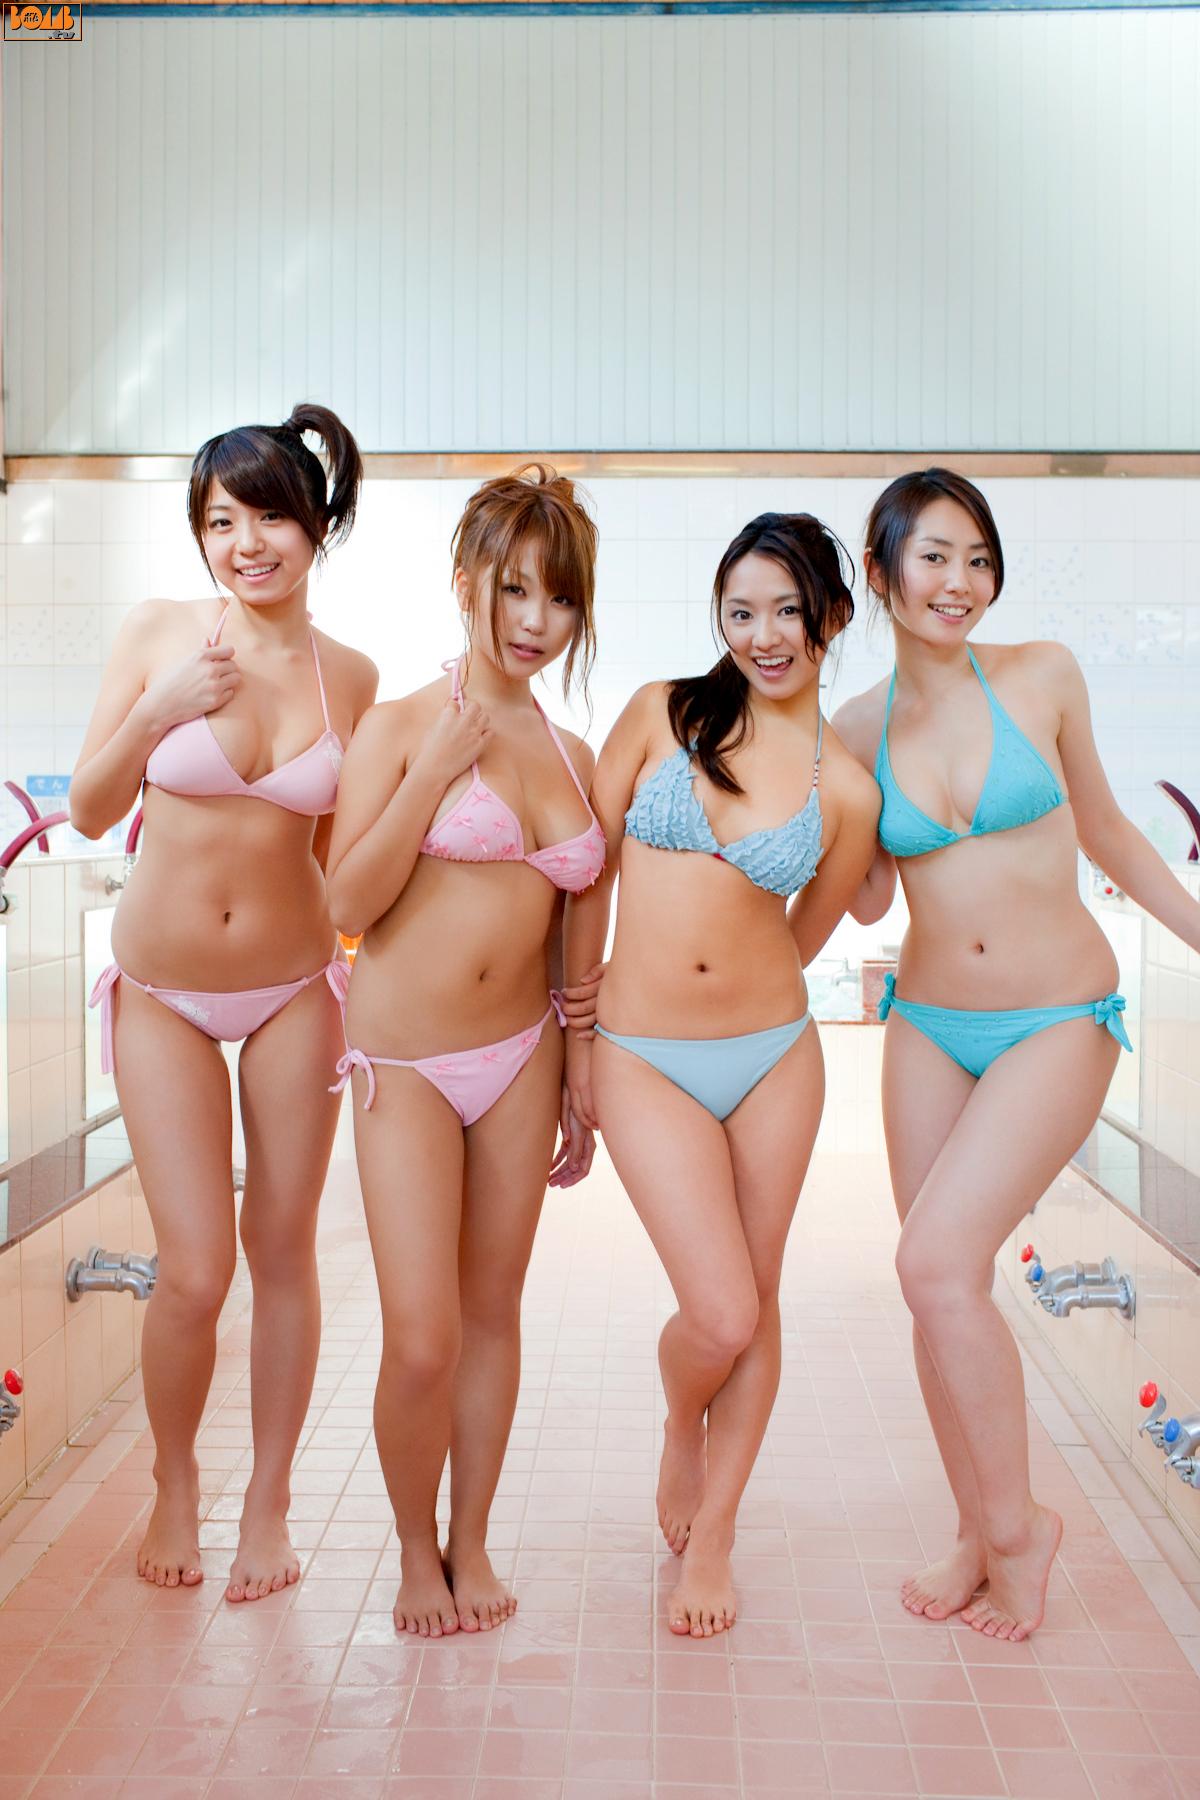 http://dl7.getuploader.com/g/9%7Cmanko/173/shizuka-nakamura-00578461.jpg